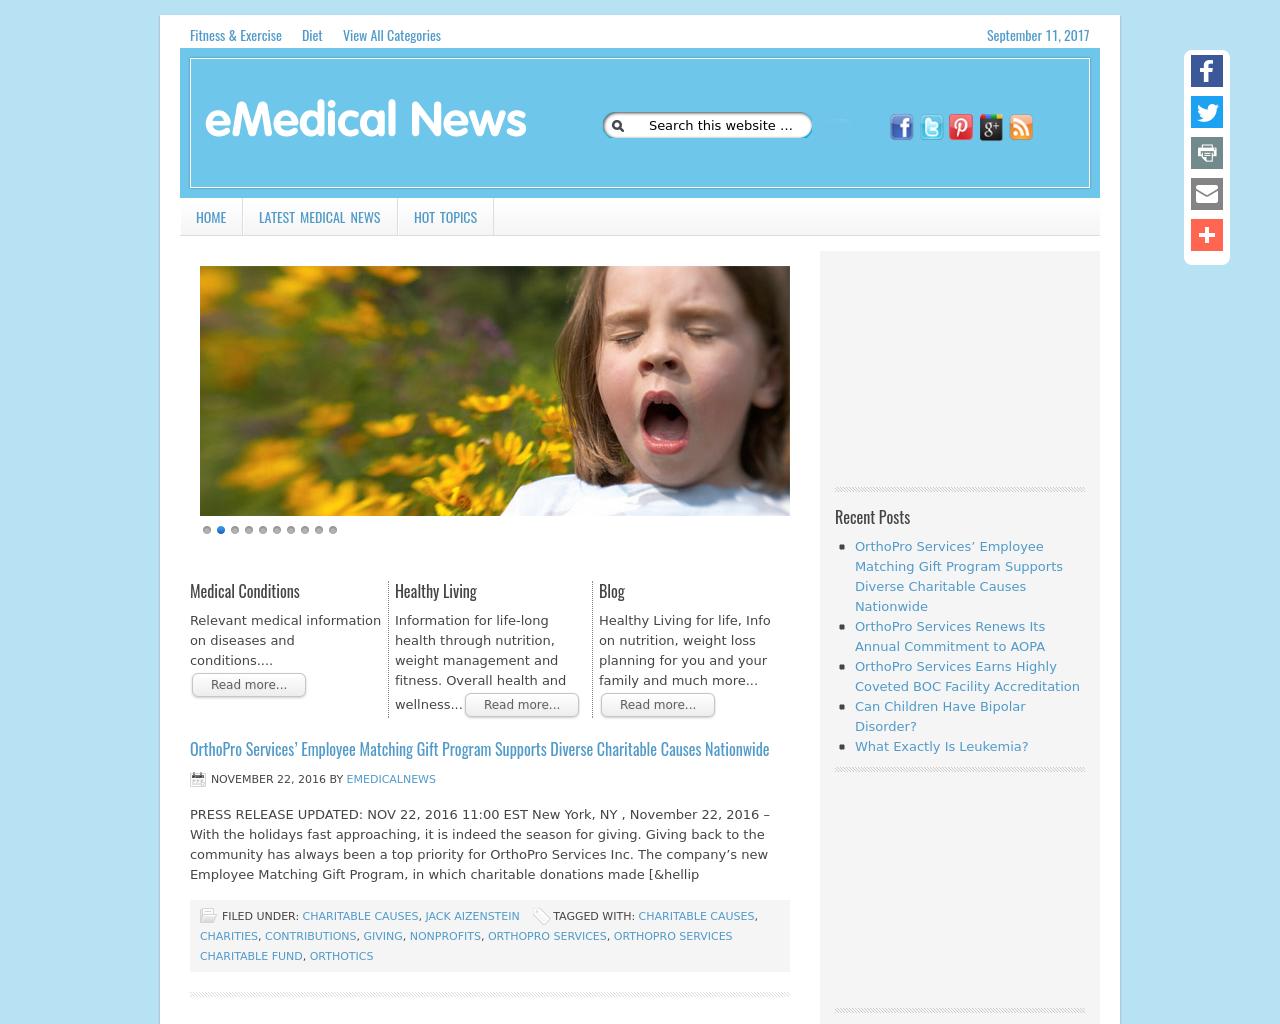 eMedical-News-Advertising-Reviews-Pricing